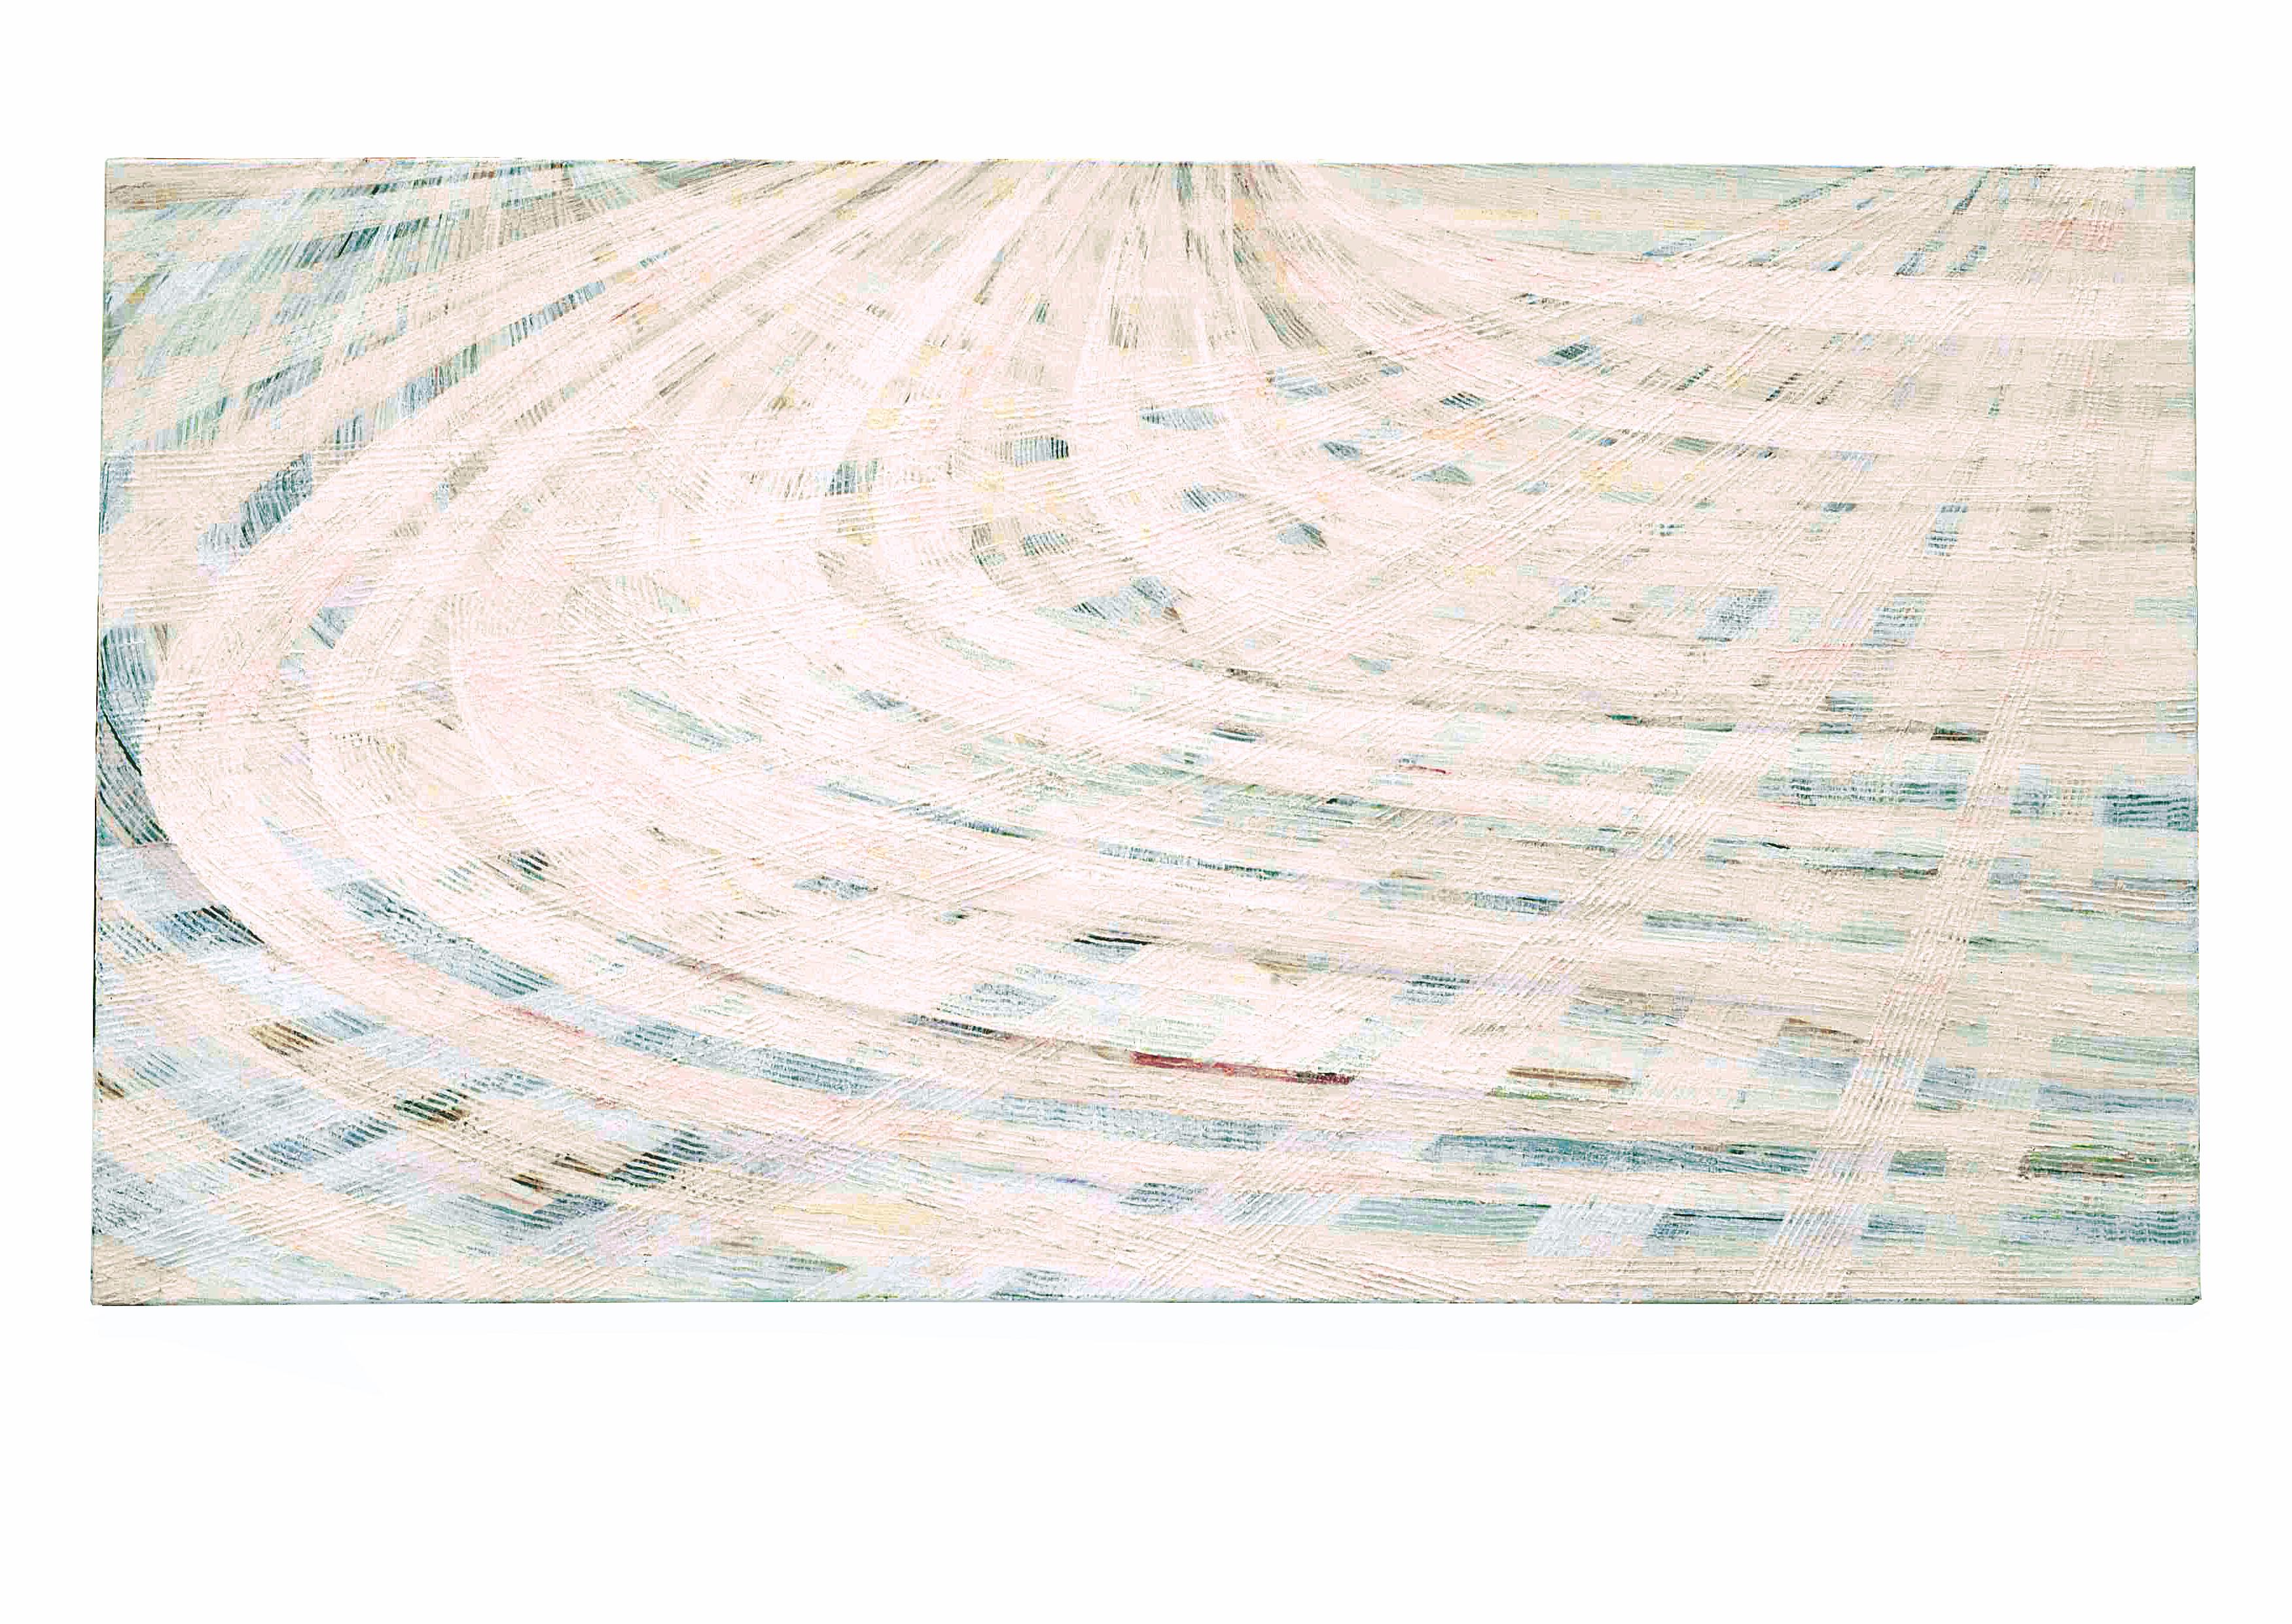 180 x 320 - 2007- 300 dpi